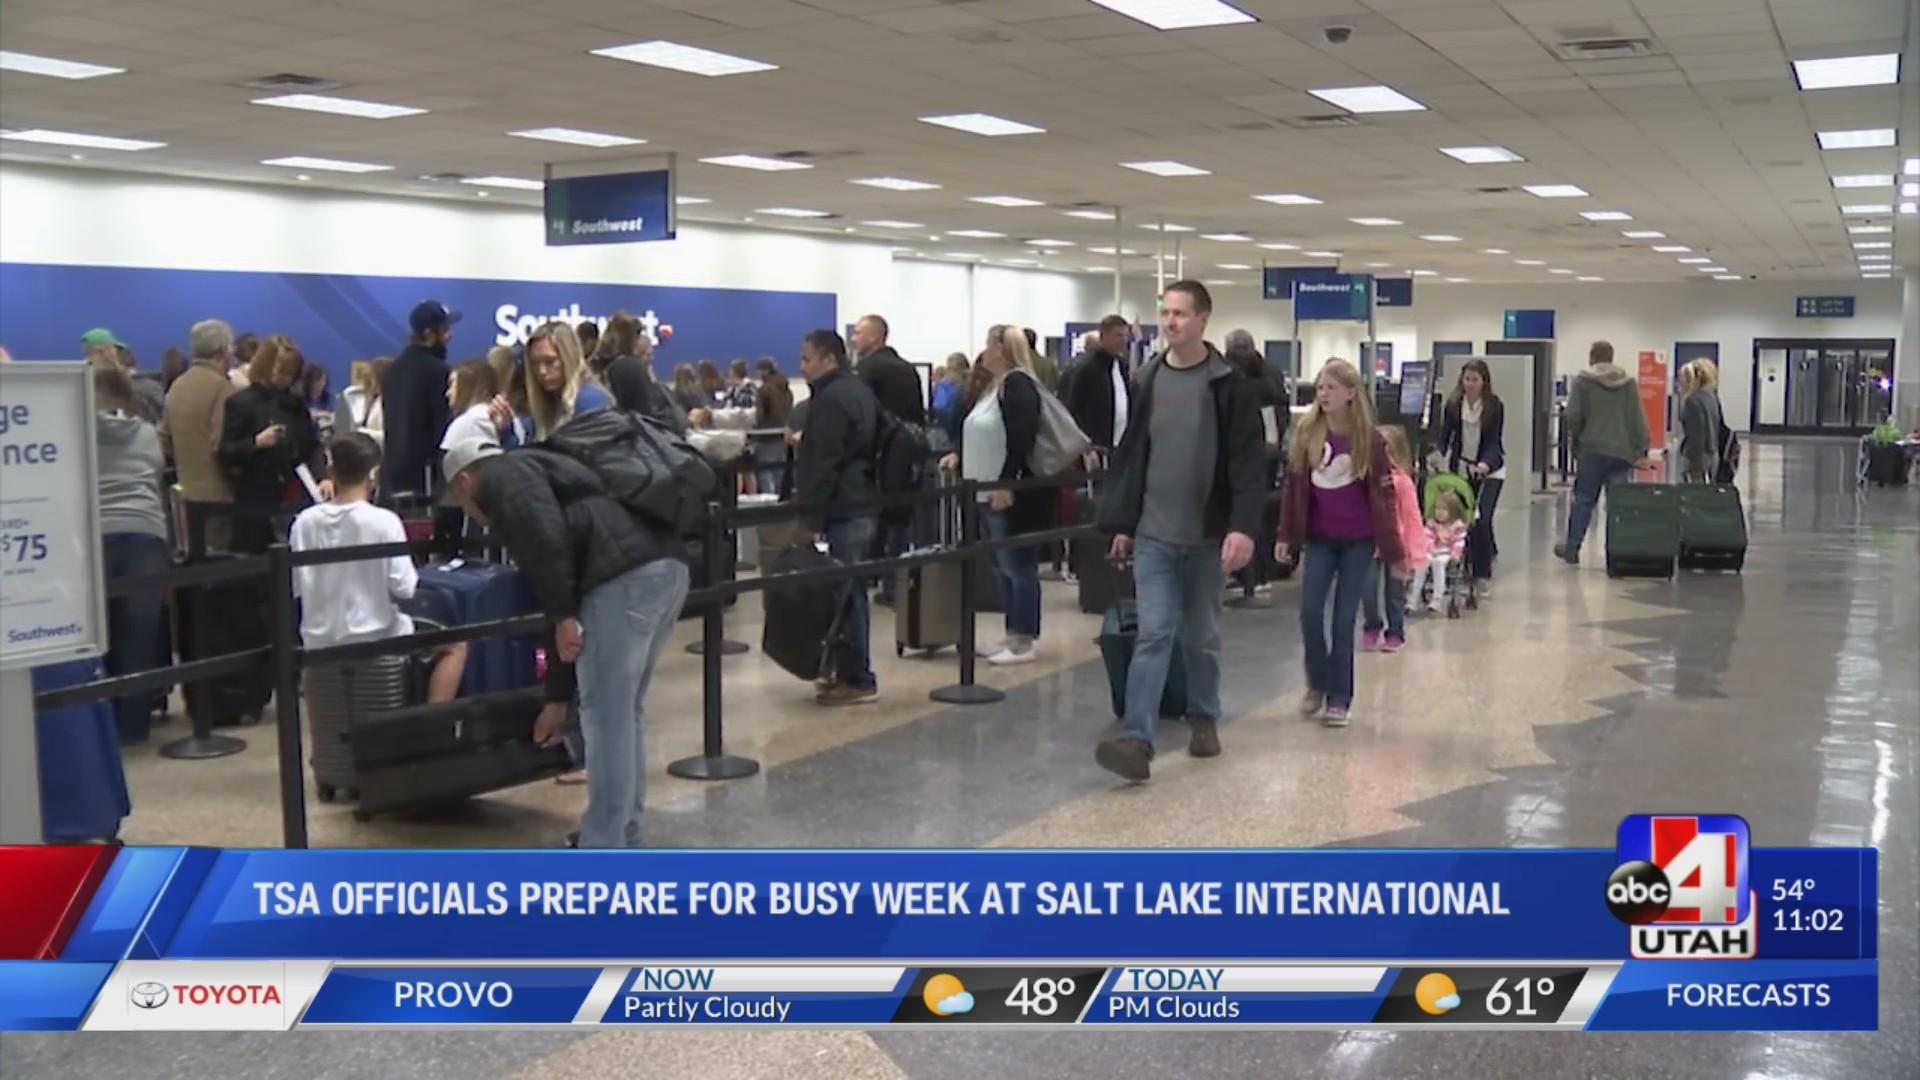 TSA officials prepare for busy week at Salt Lake International